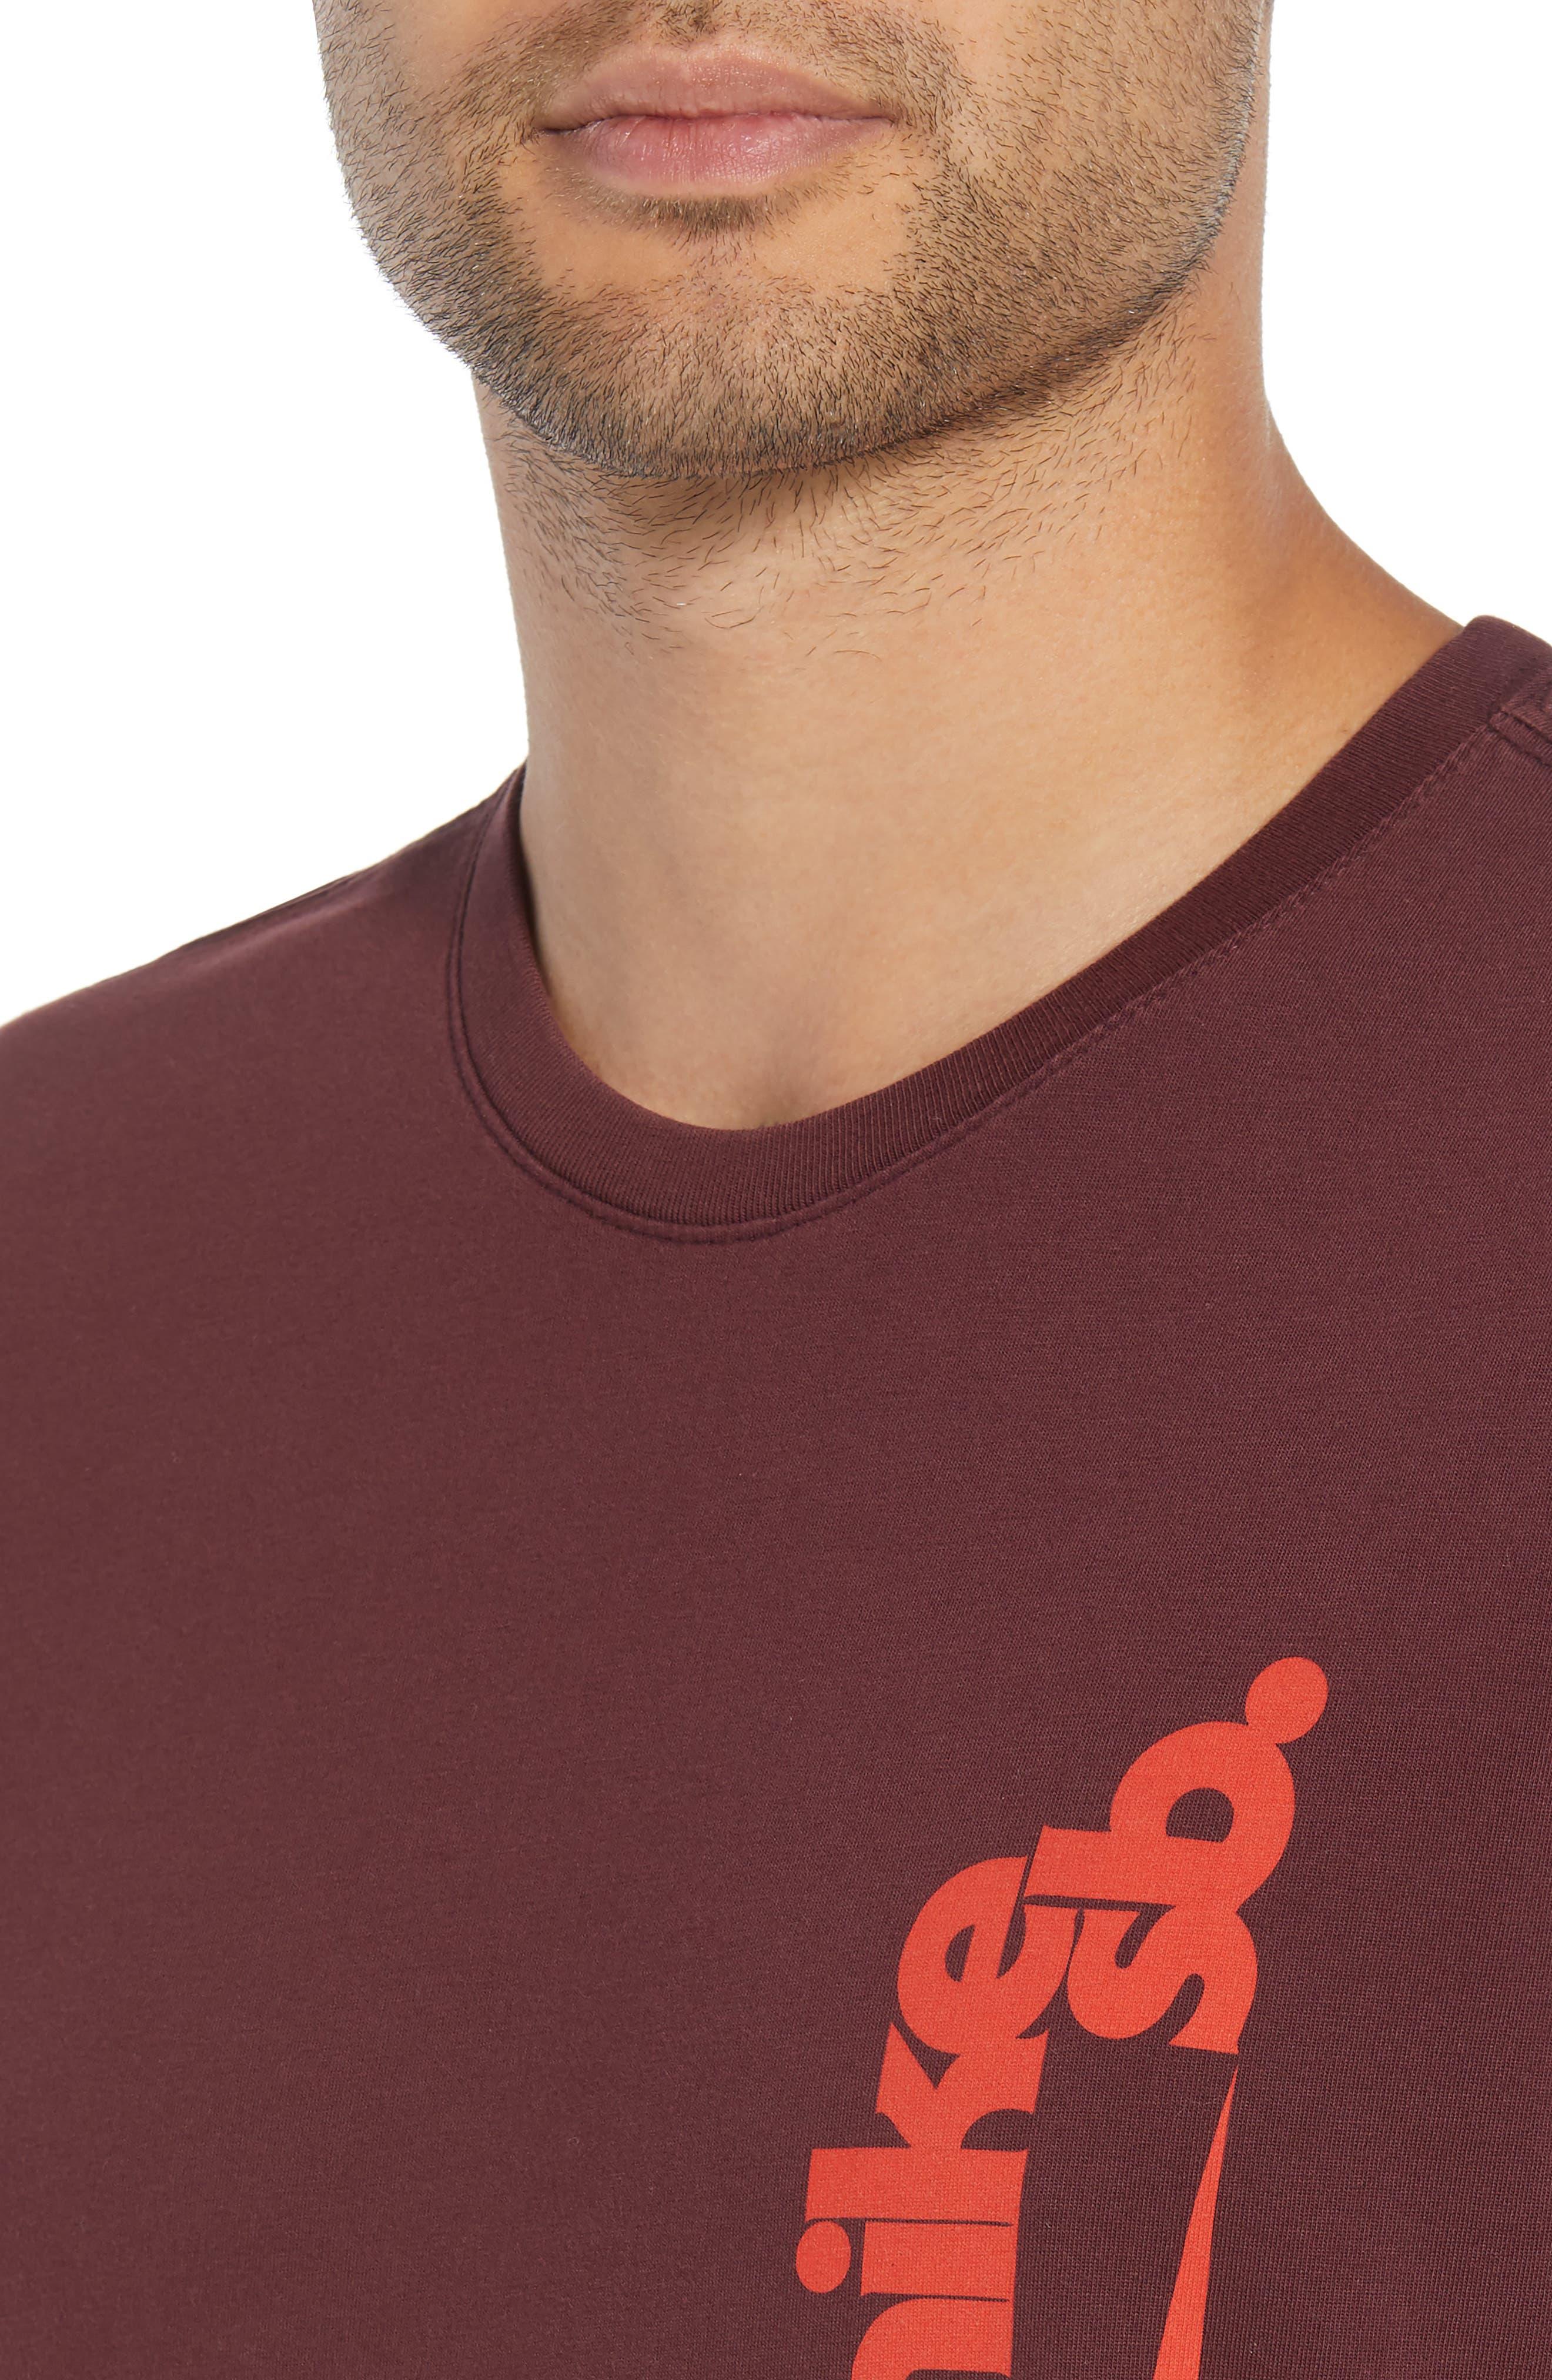 Crewneck T-Shirt,                             Alternate thumbnail 4, color,                             BURGUNDY CRUSH/ HABANERO RED